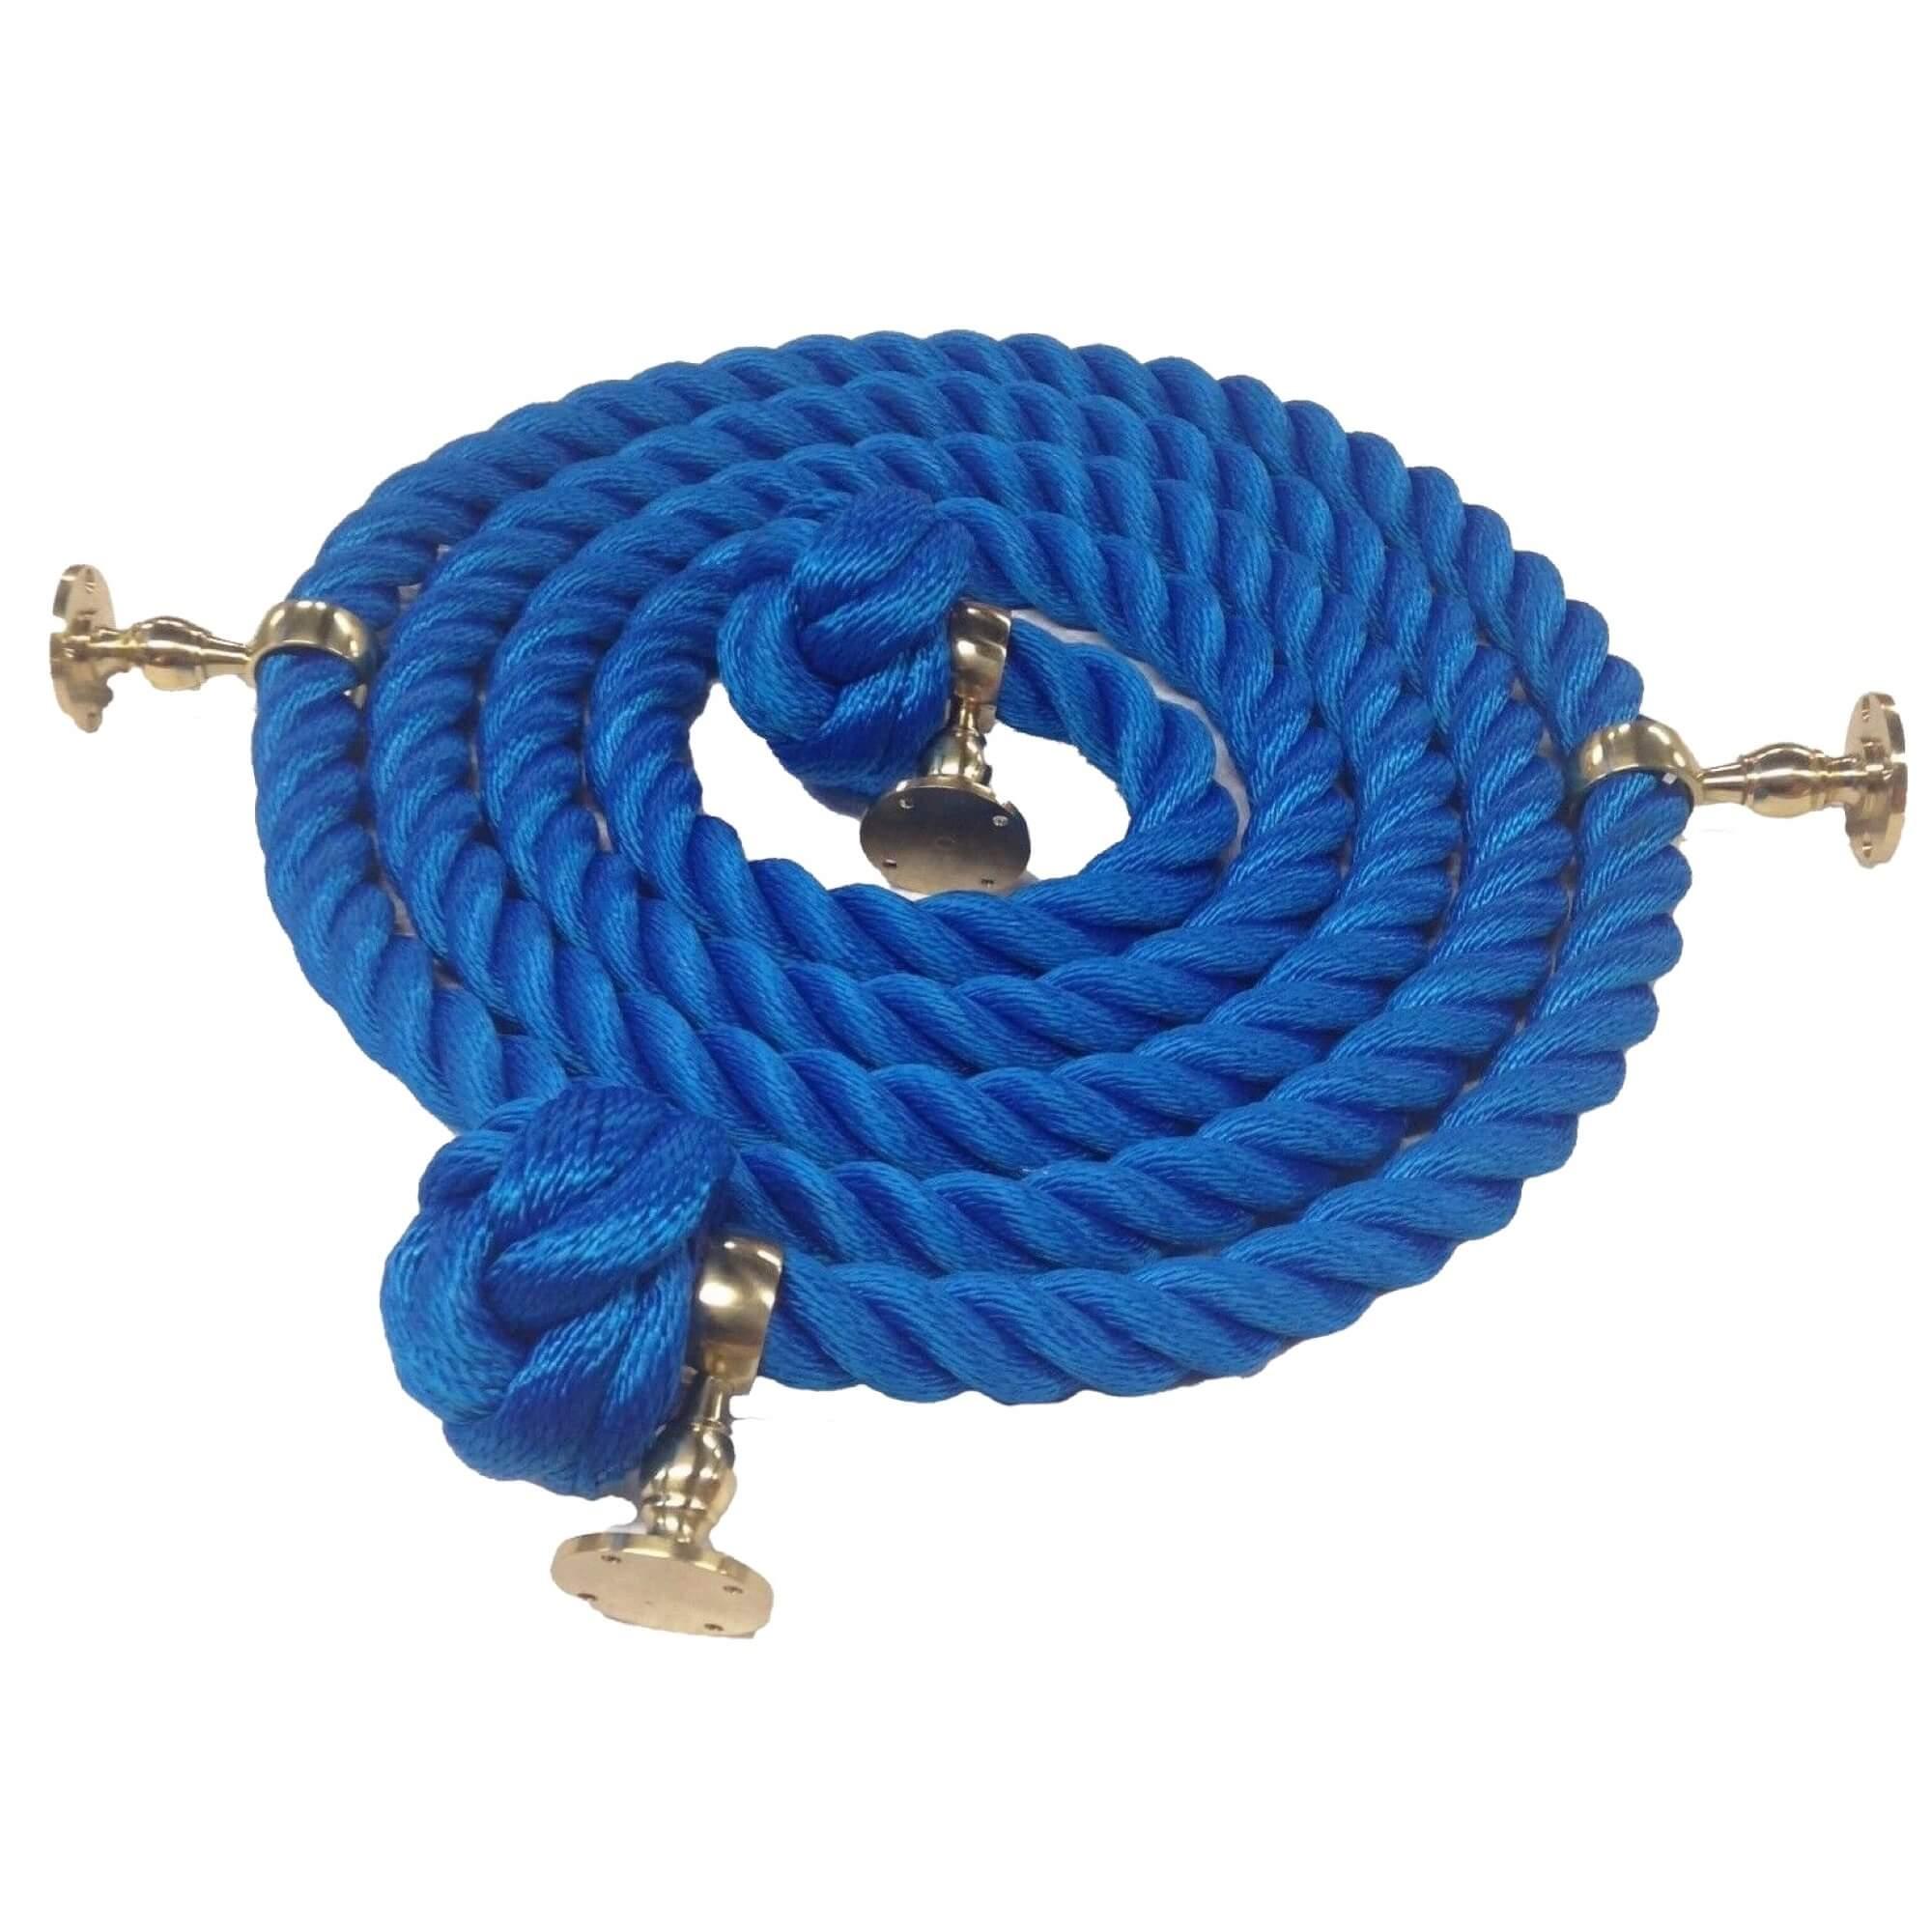 Softline Multifilament Rope